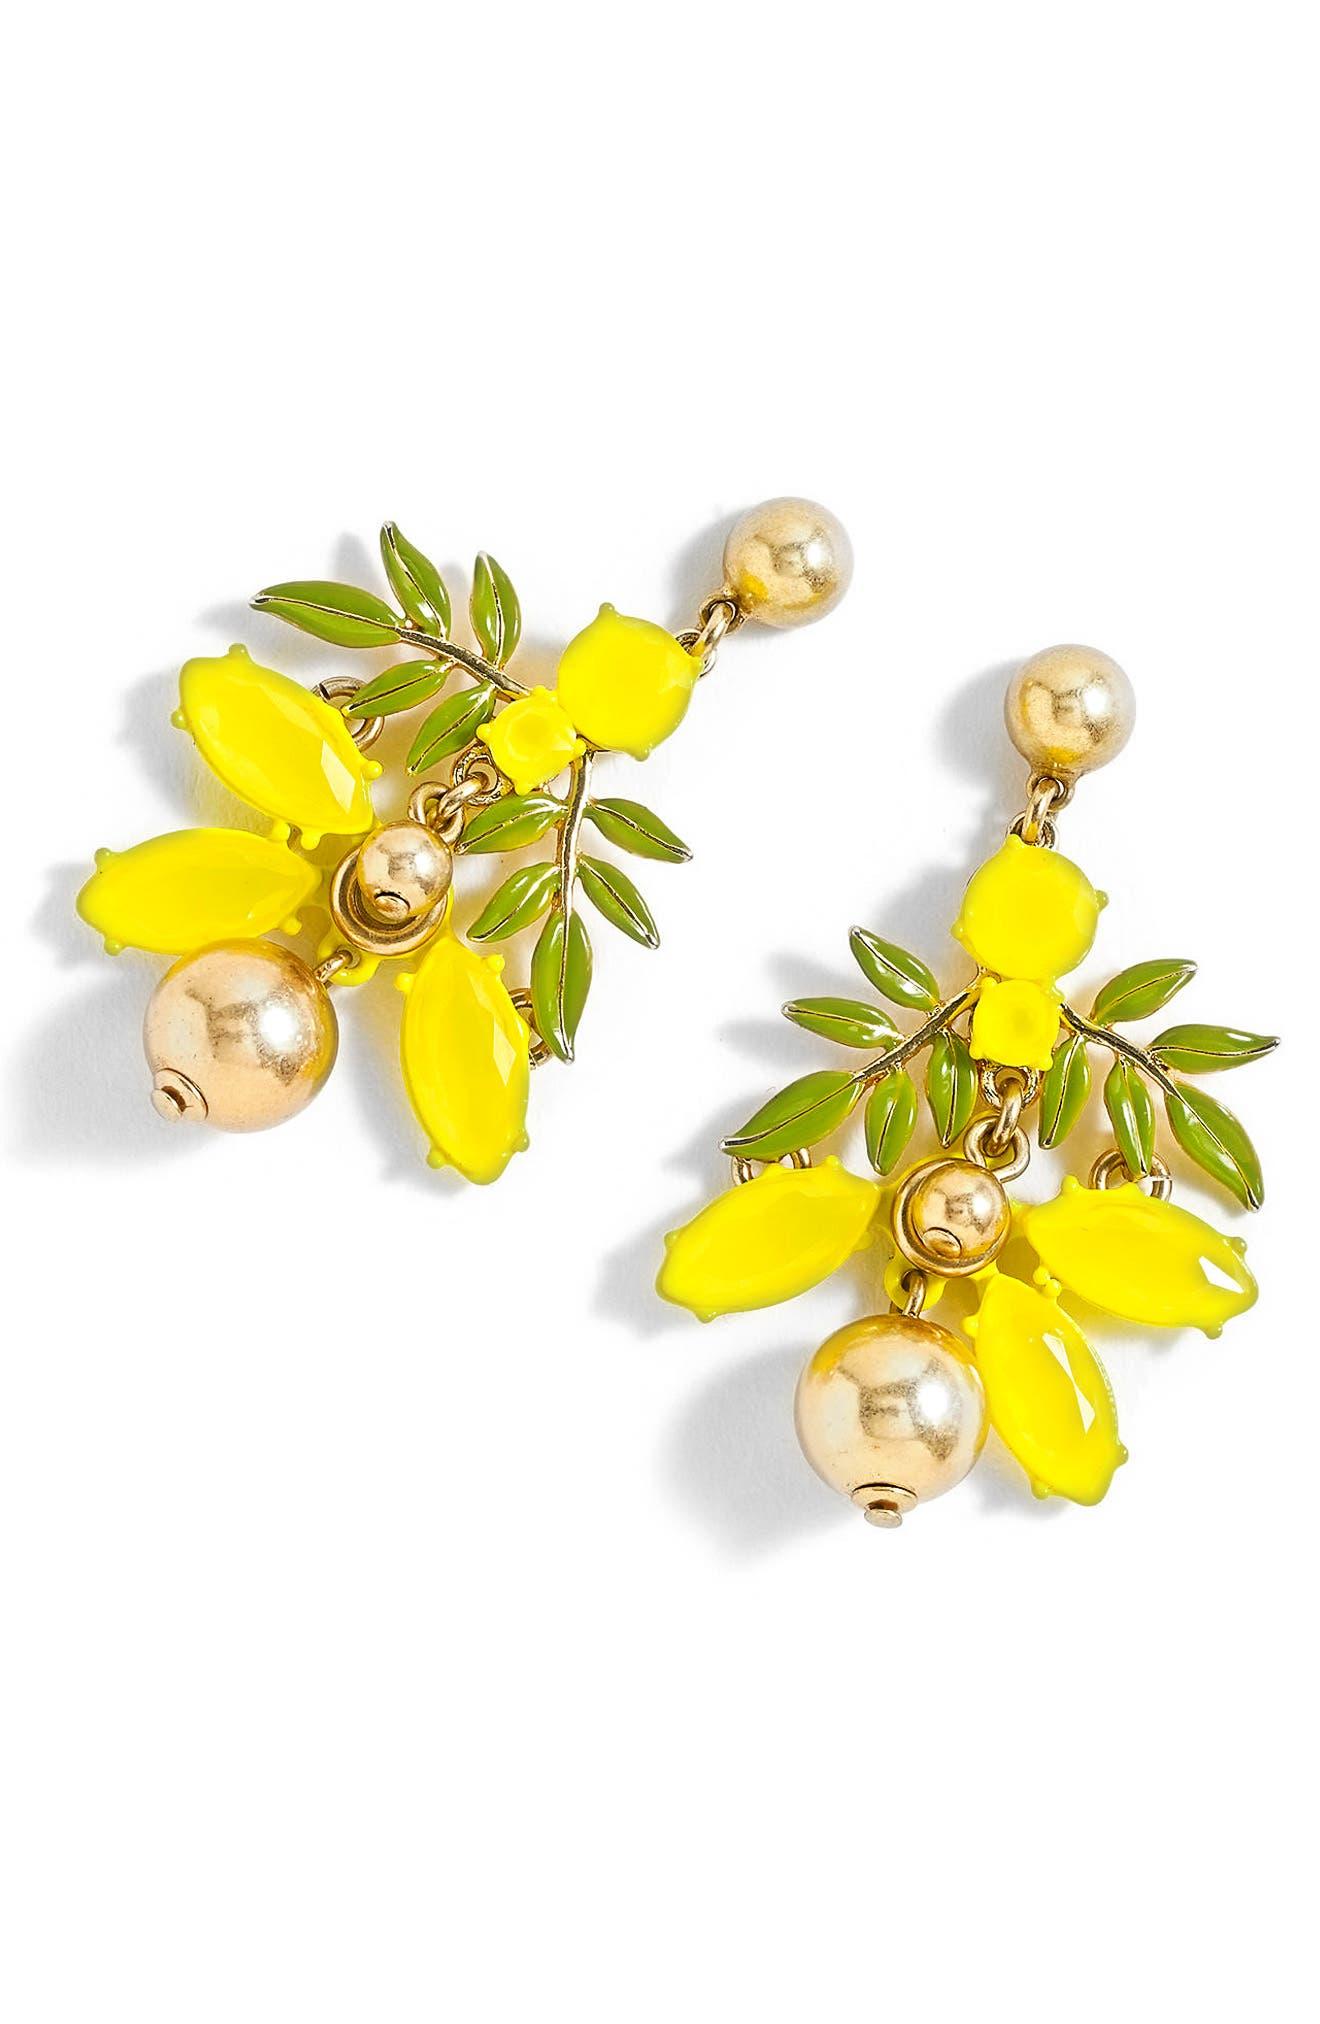 Alternate Image 1 Selected - J.Crew Lemon Tree Earrings